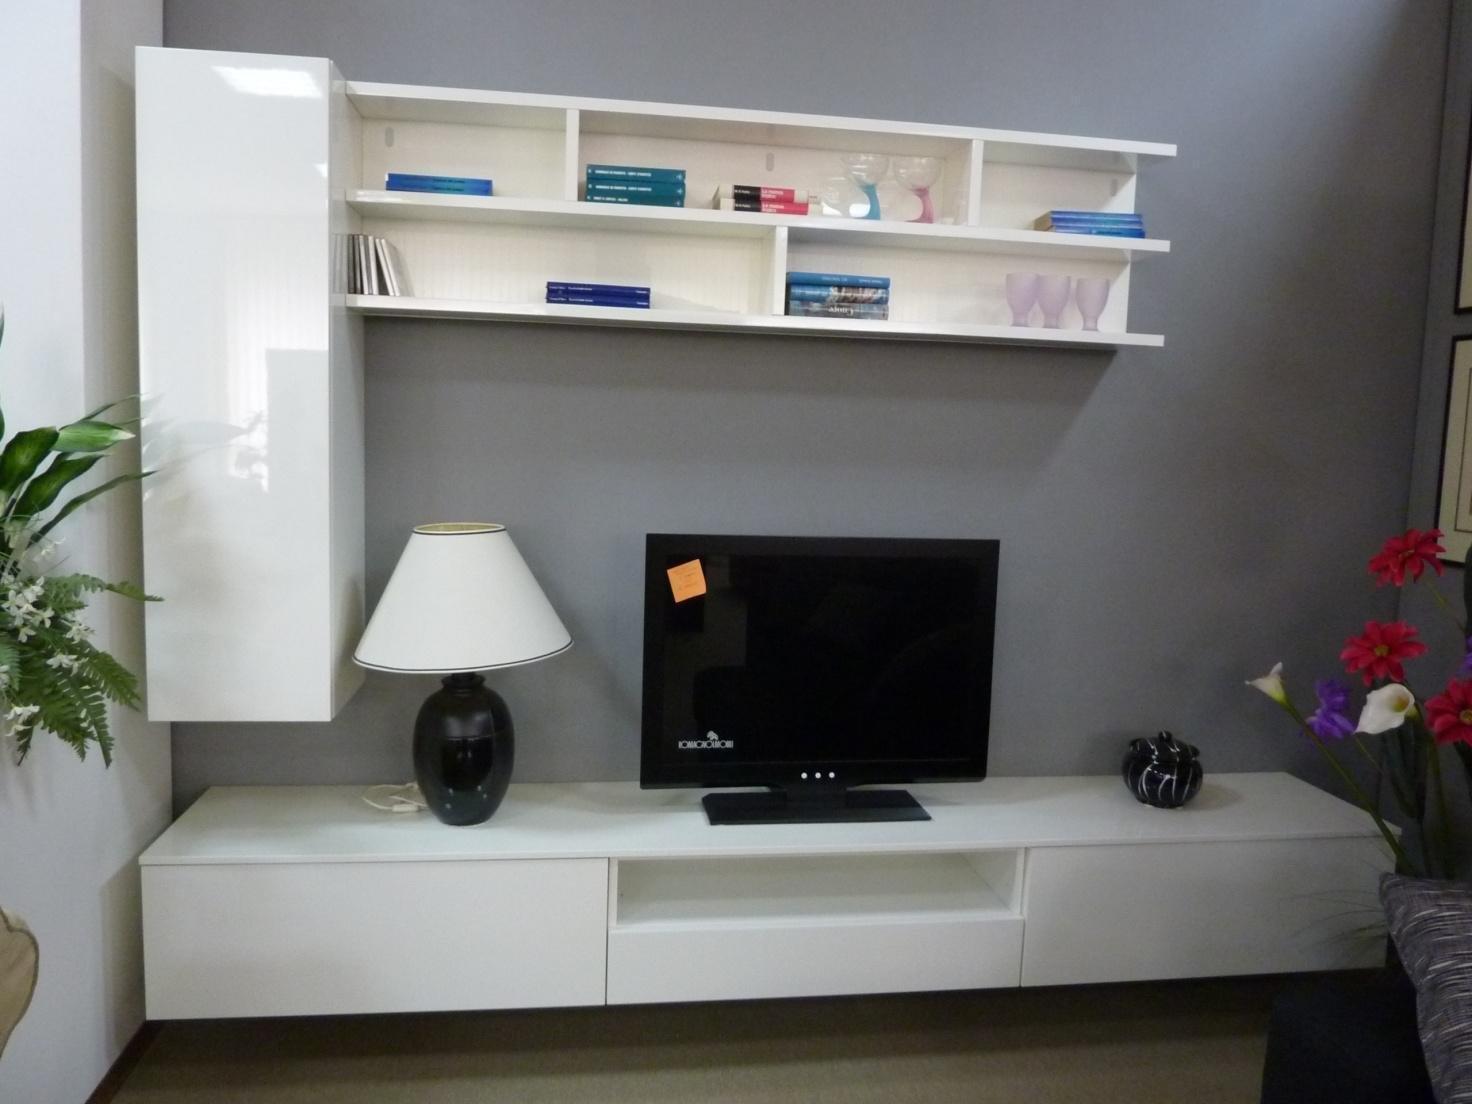 Mobili Ingresso Kartell: Lampade kartell da comodino mobili cucine ...